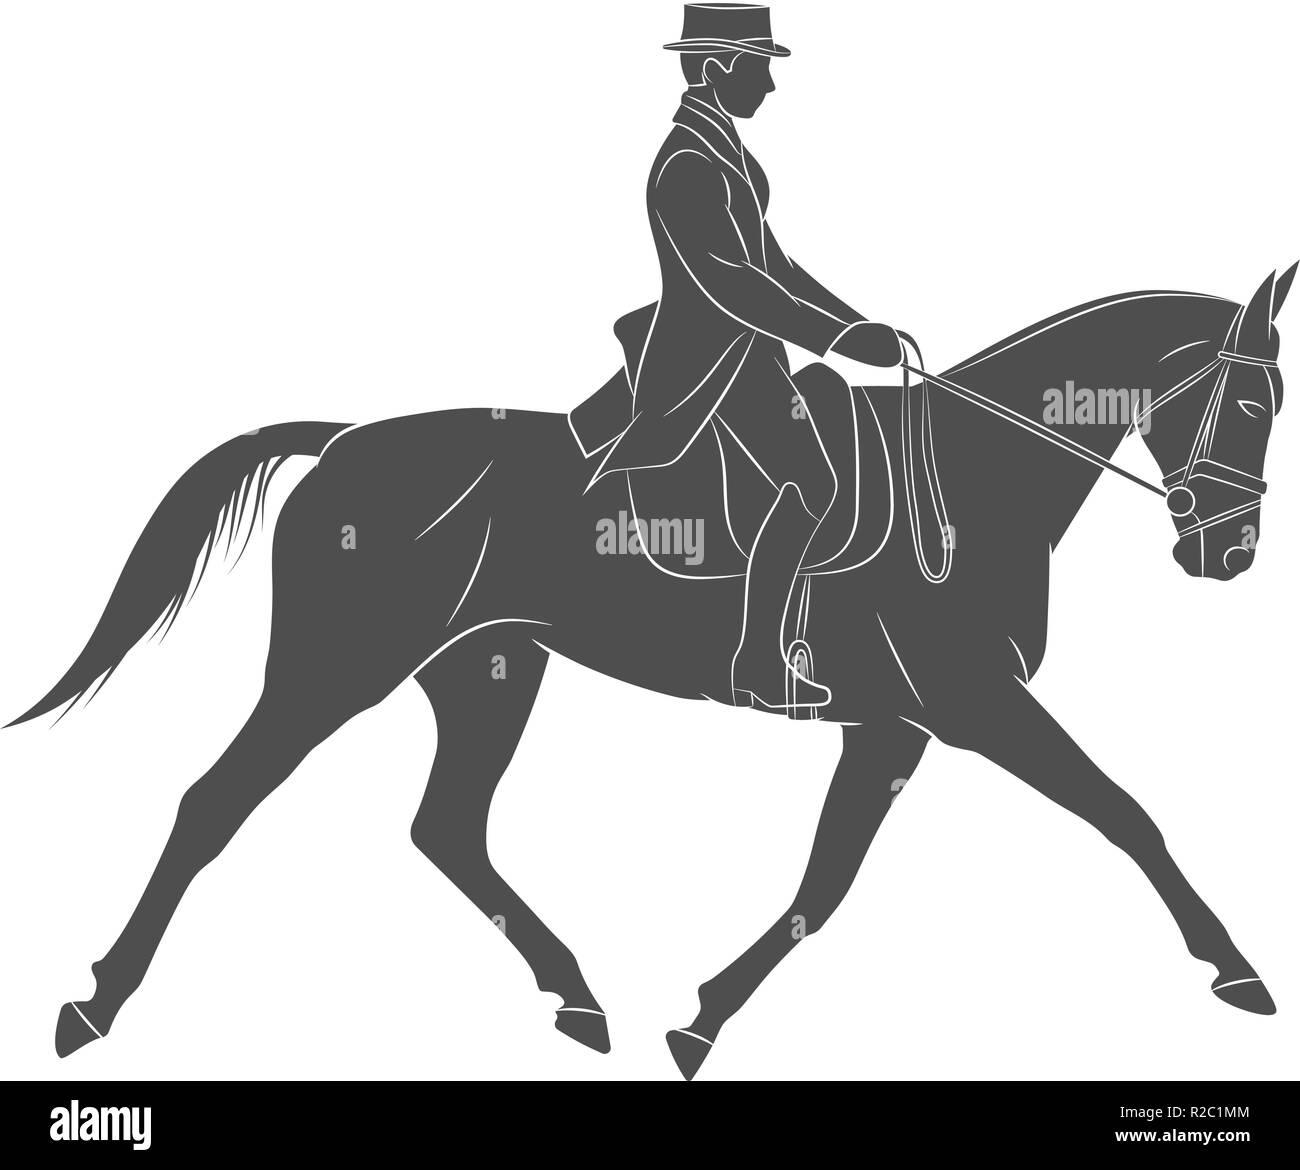 Equestrian sport. Jockey in uniform riding horse. Dressage - Stock Image